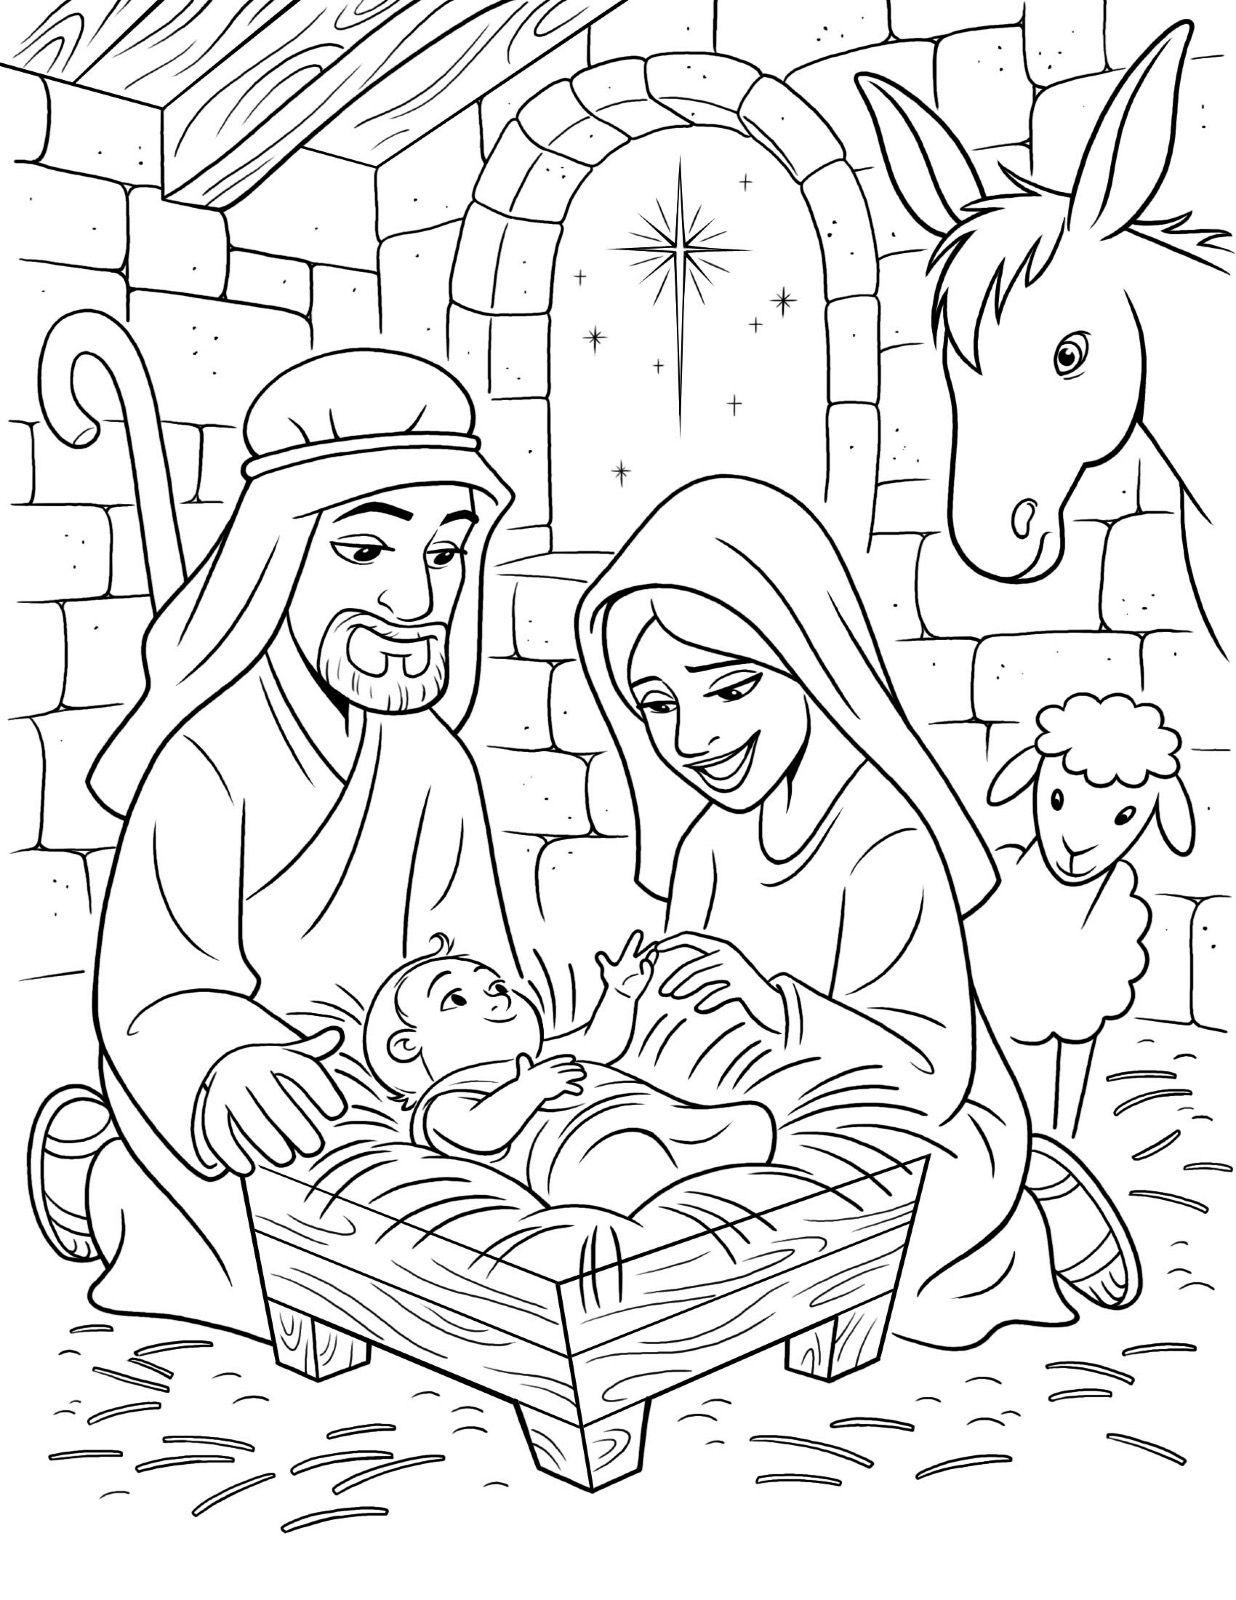 Edeka Nikolaus Ausmalbilder : Pin Von Maribel Fern Ndez Rodriguez Auf Biblia Pinterest